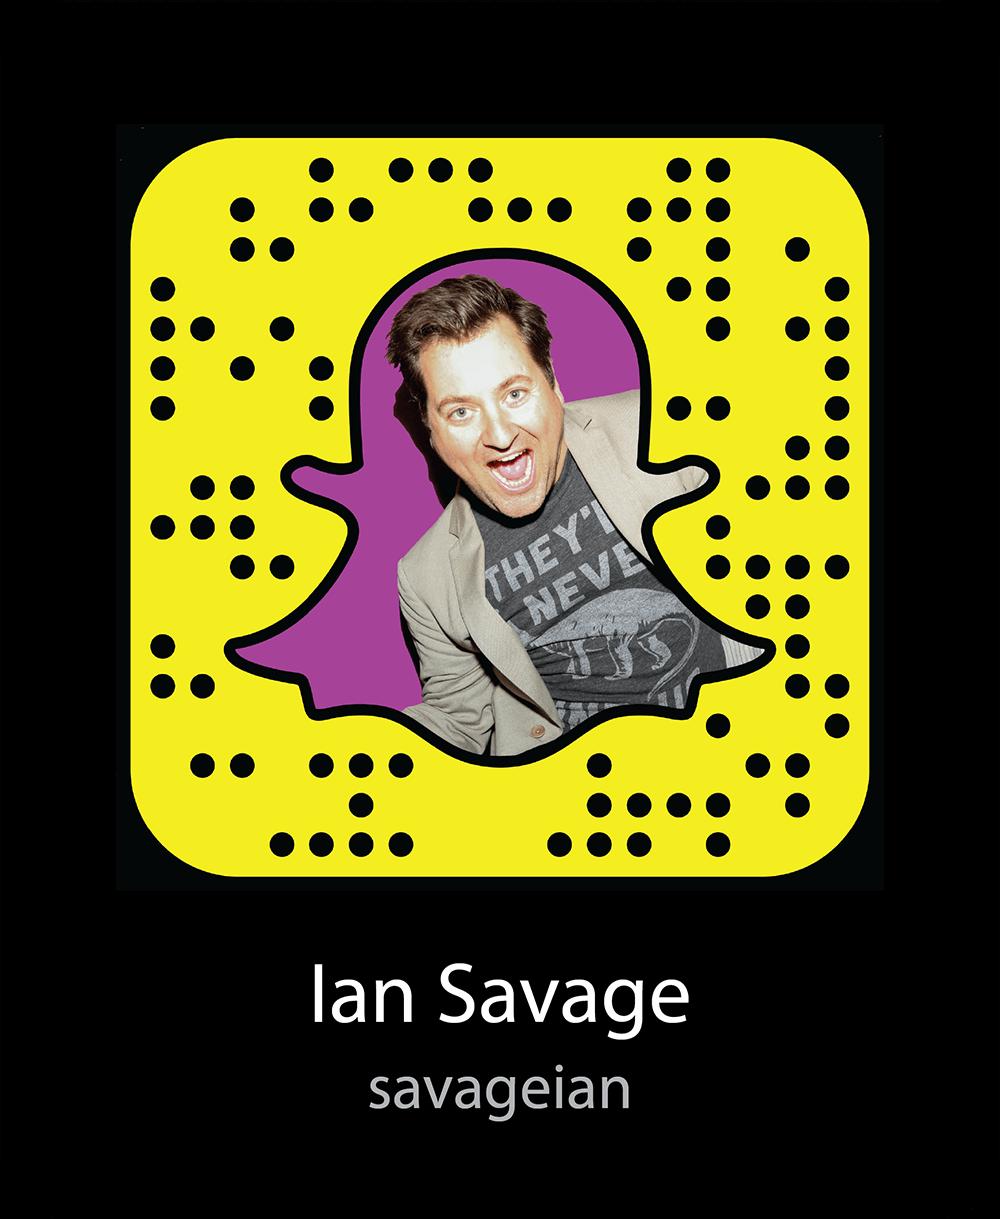 ian-savage-storytellers-snapchat-snapcode copy 2.png